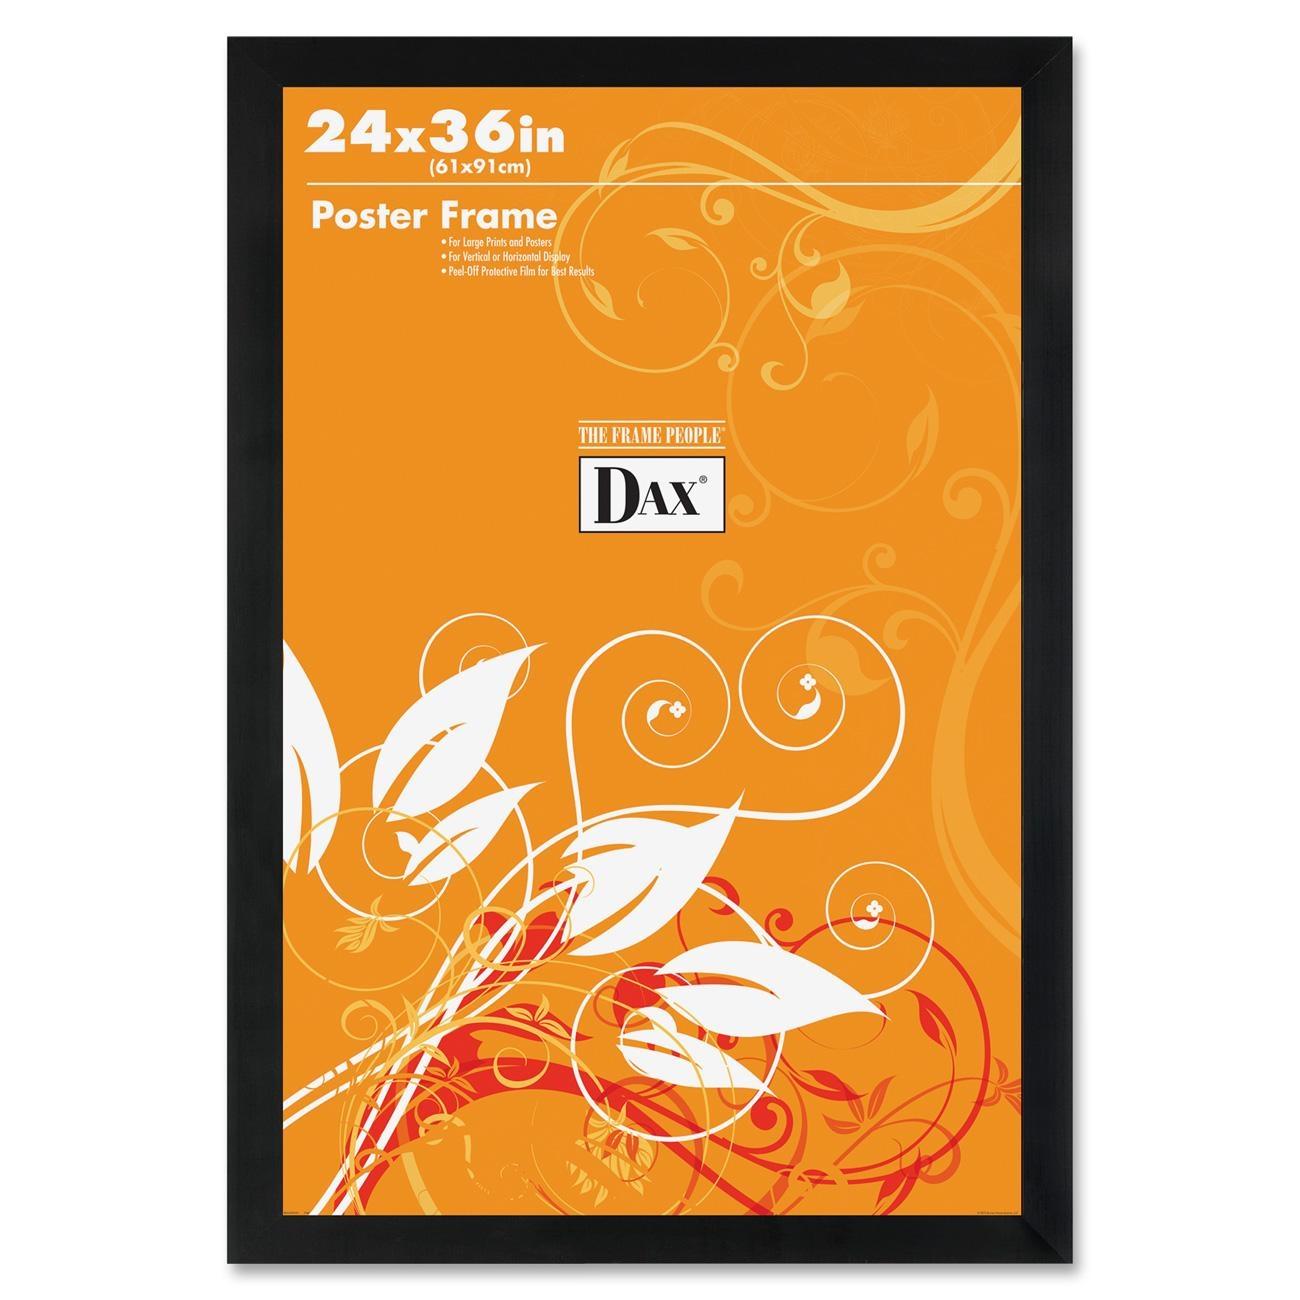 "Burnes Poster Frame - 24"" X 36"" Insert - Wall Mountable - Vertical, Horizontal - Black (2863U2X)"